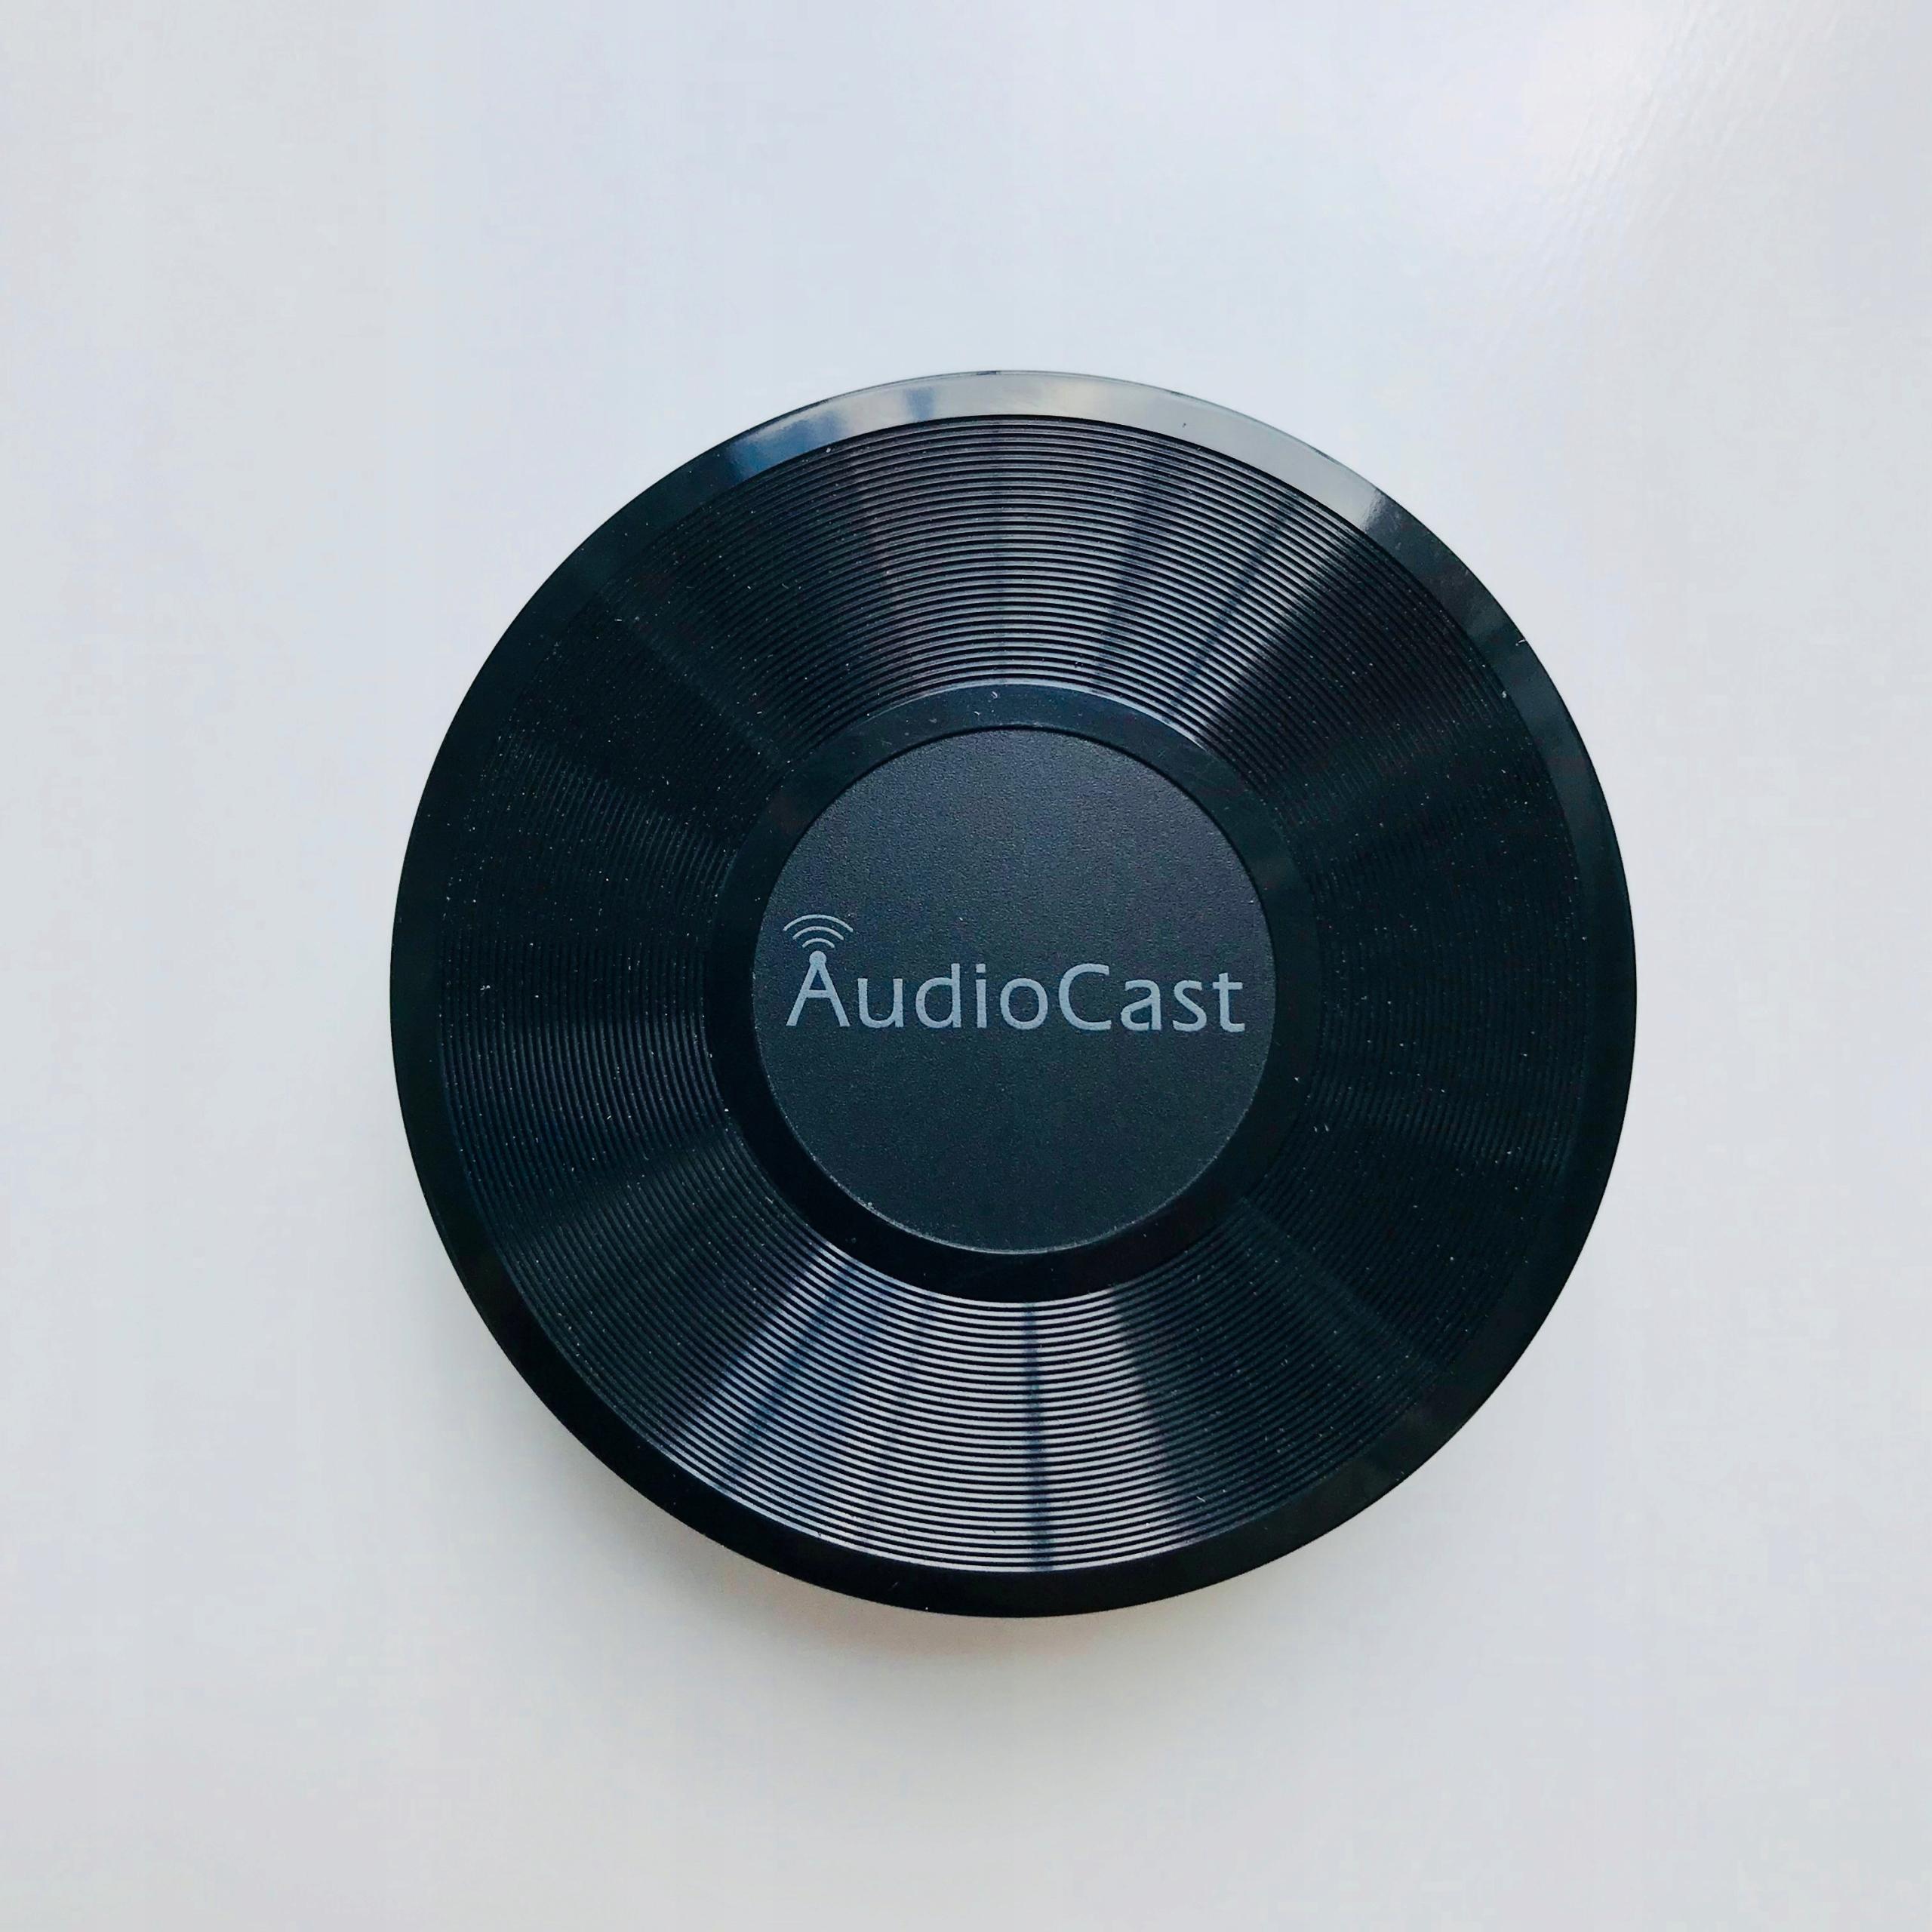 iEAST AudioCast M5 AirPlay/Spotify/DLNA/streamer